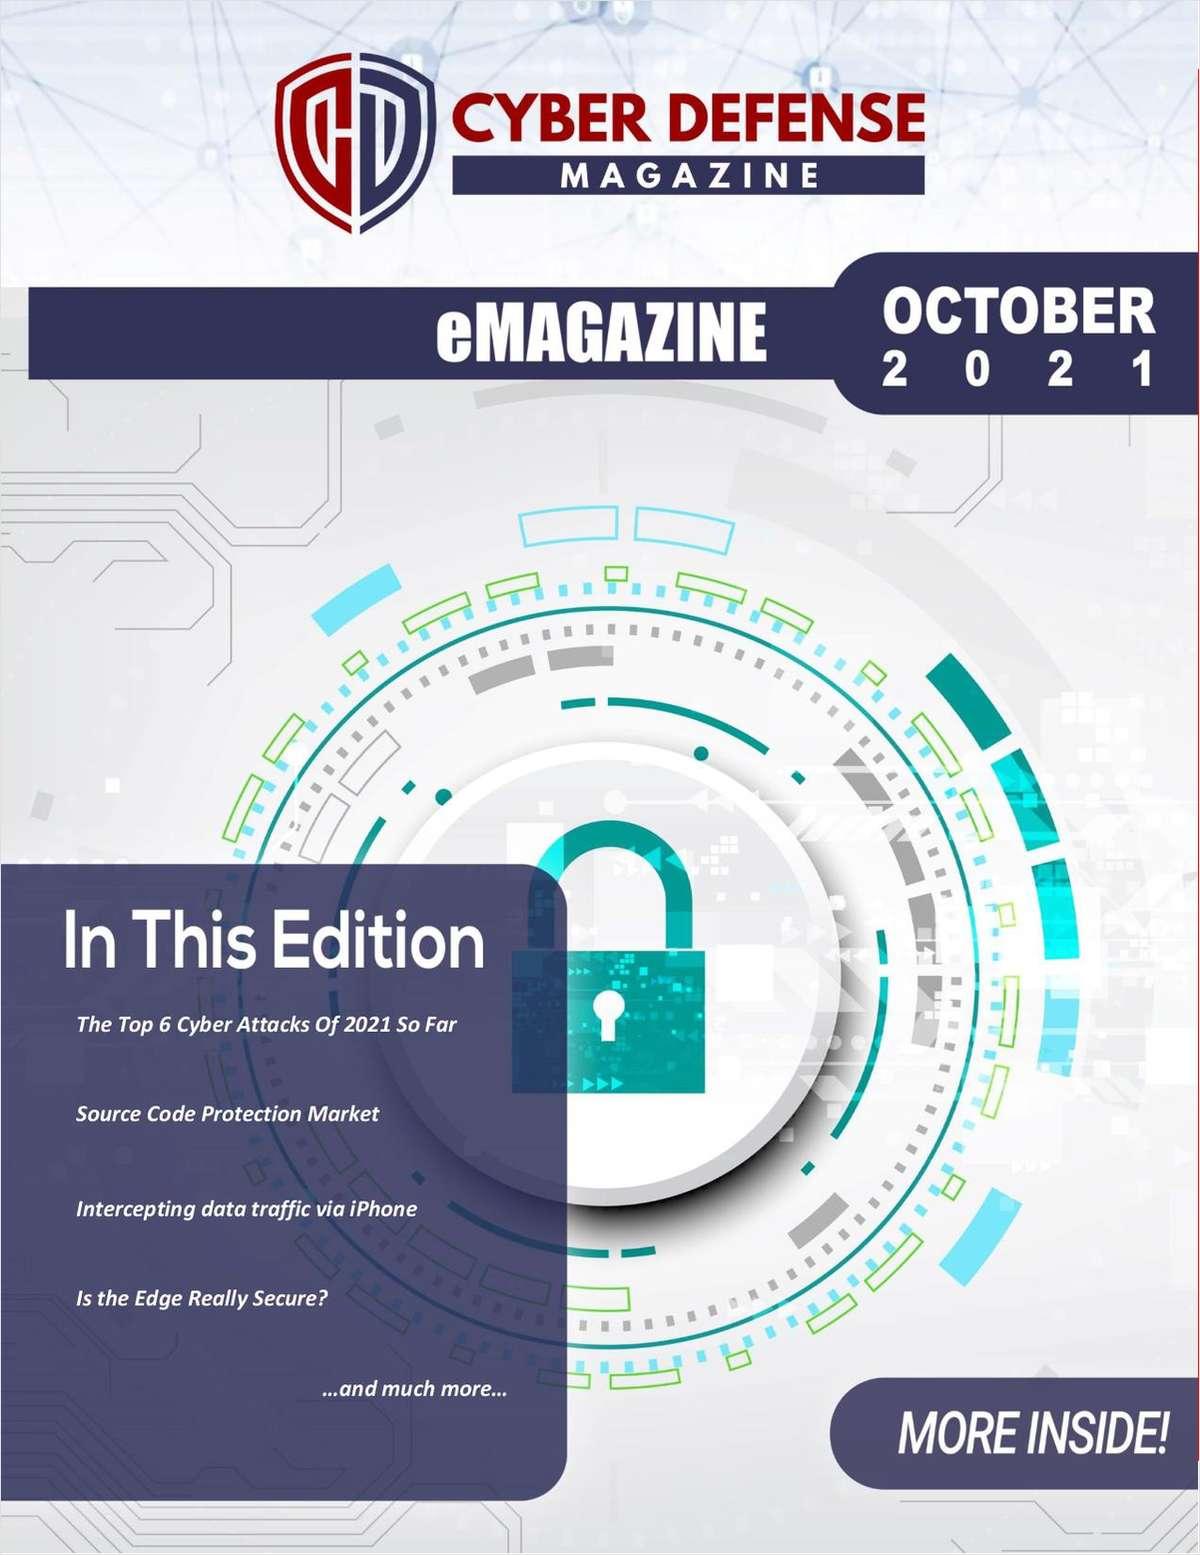 Cyber Defense Magazine October 2021 Edition